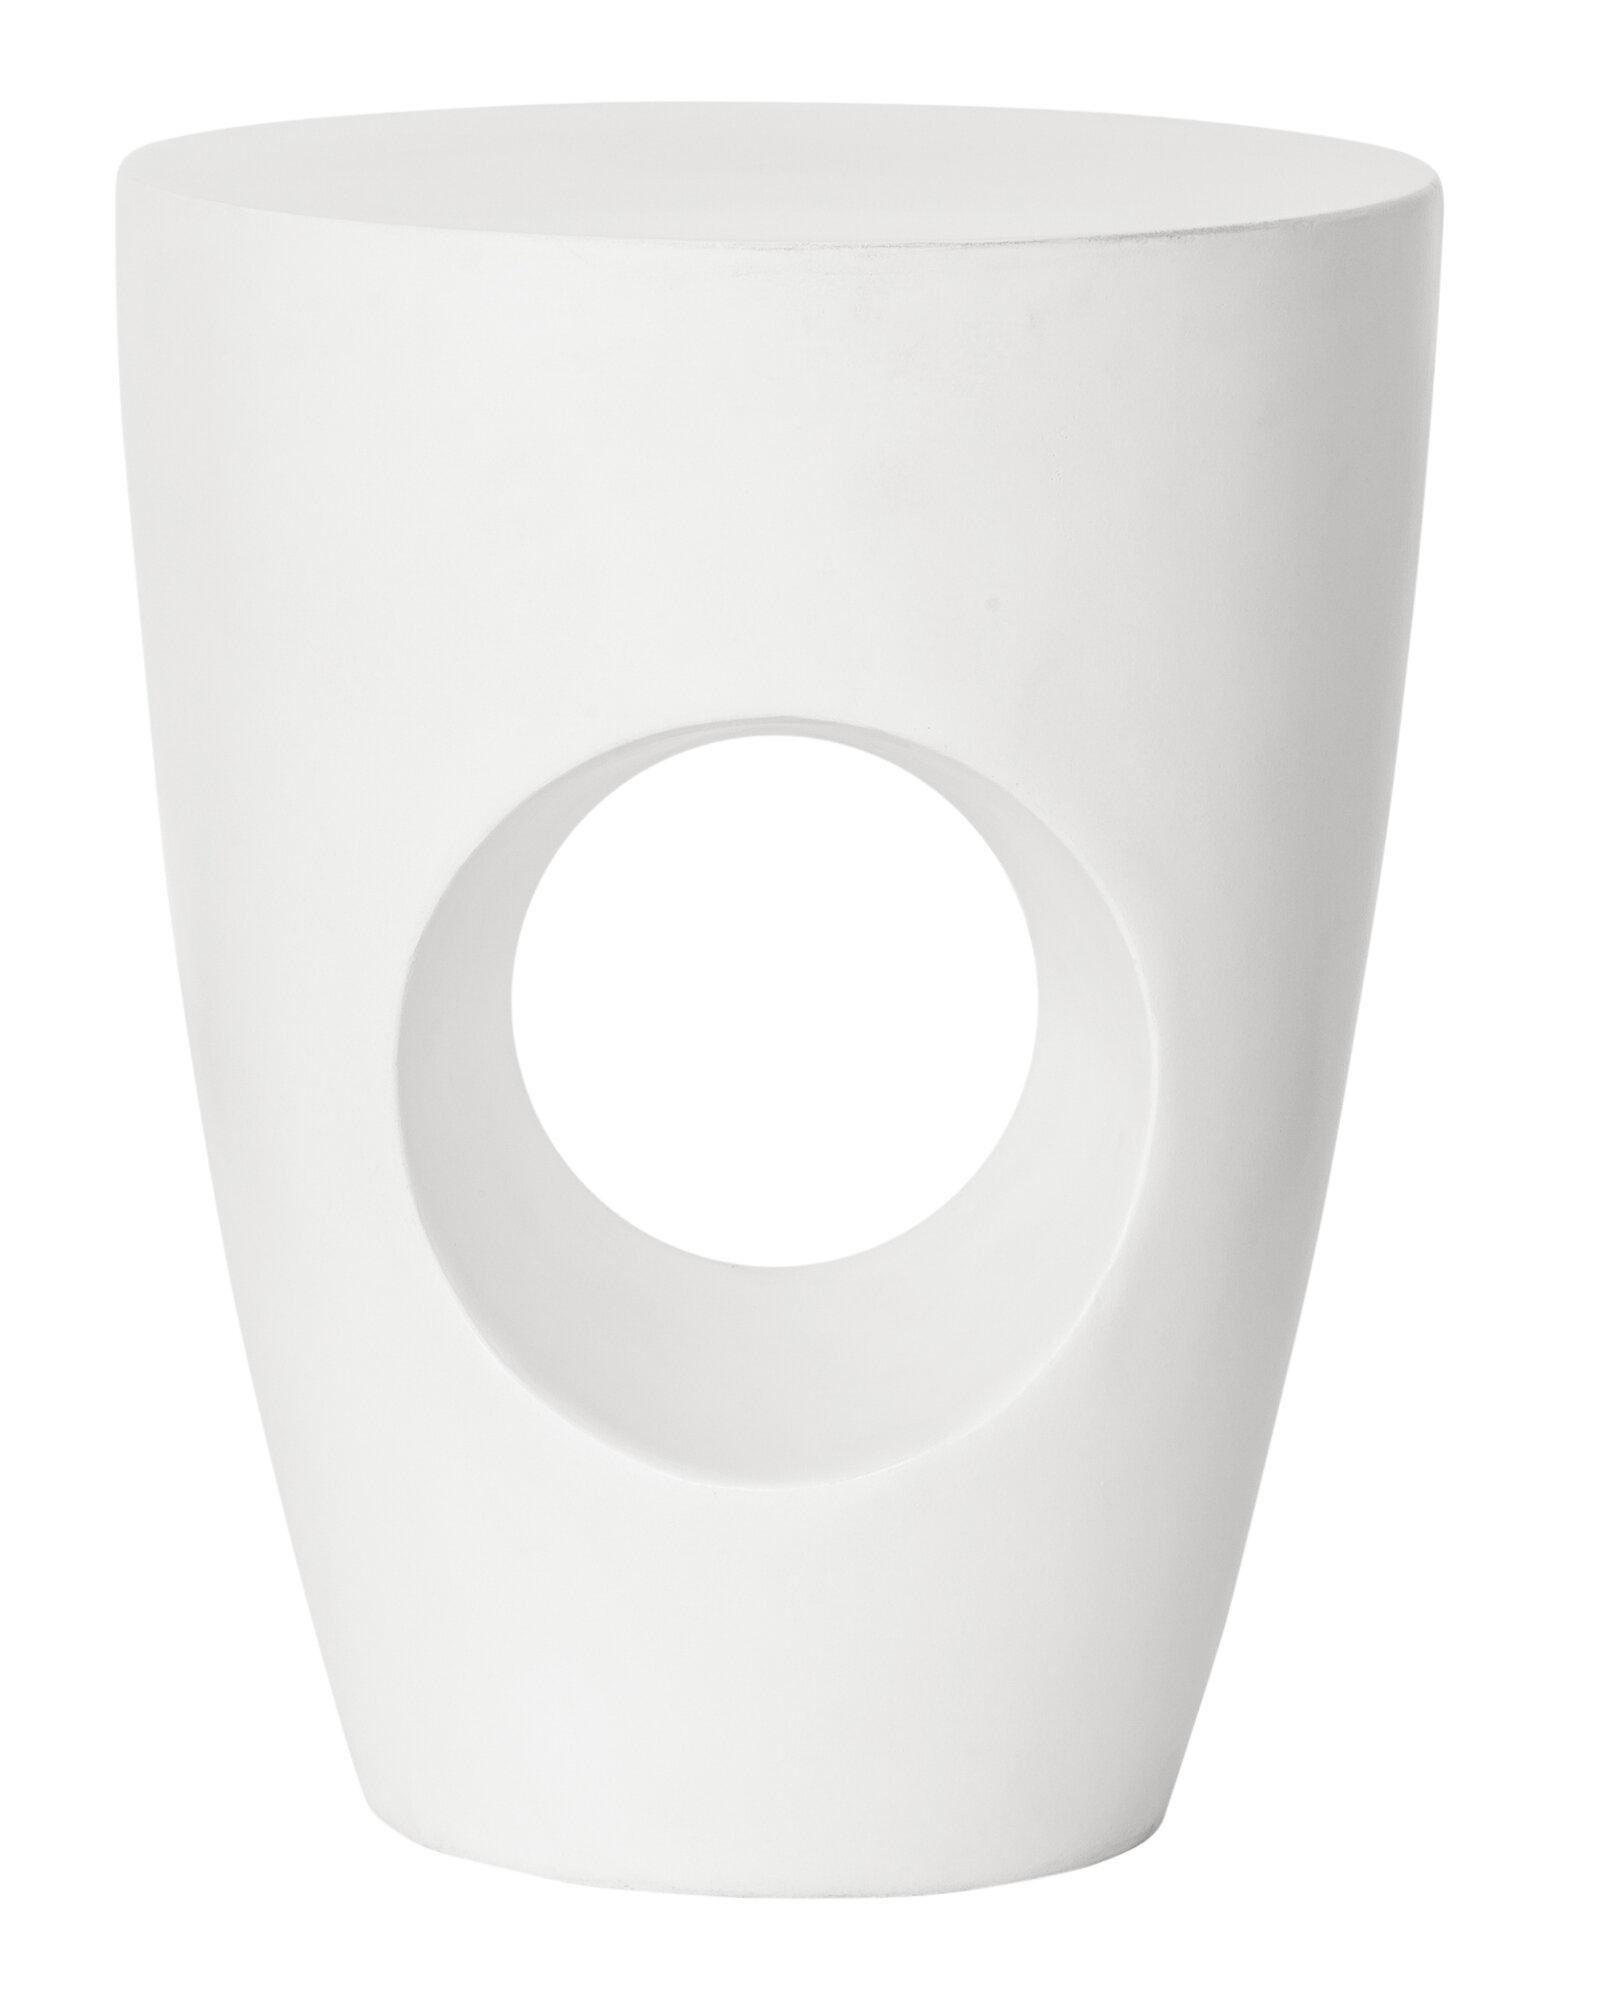 Skyler Ceramic Accent Stool In Jadiel Ceramic Garden Stools (View 23 of 25)